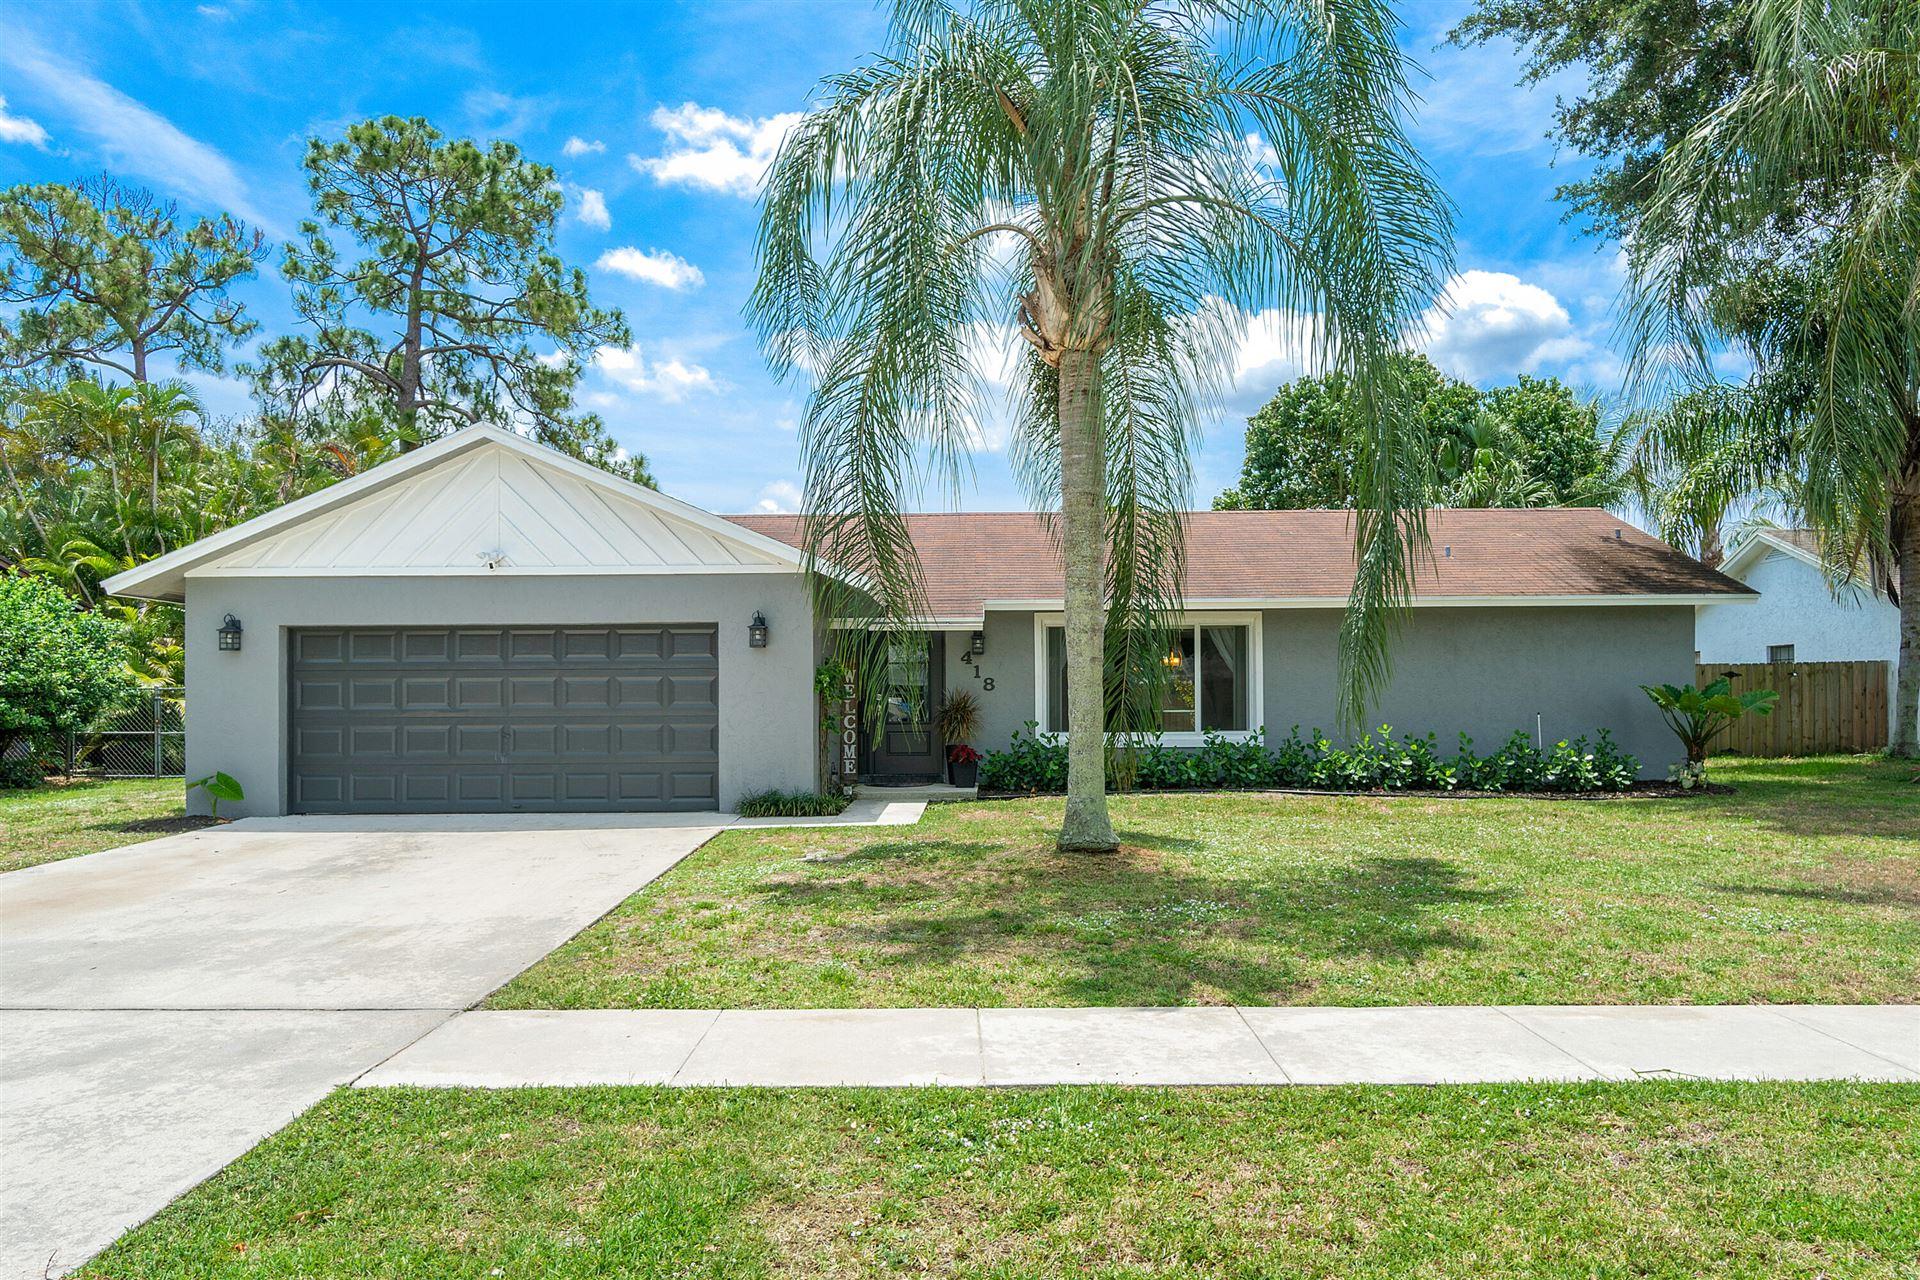 418 La Mancha Avenue, Royal Palm Beach, FL 33411 - MLS#: RX-10713401